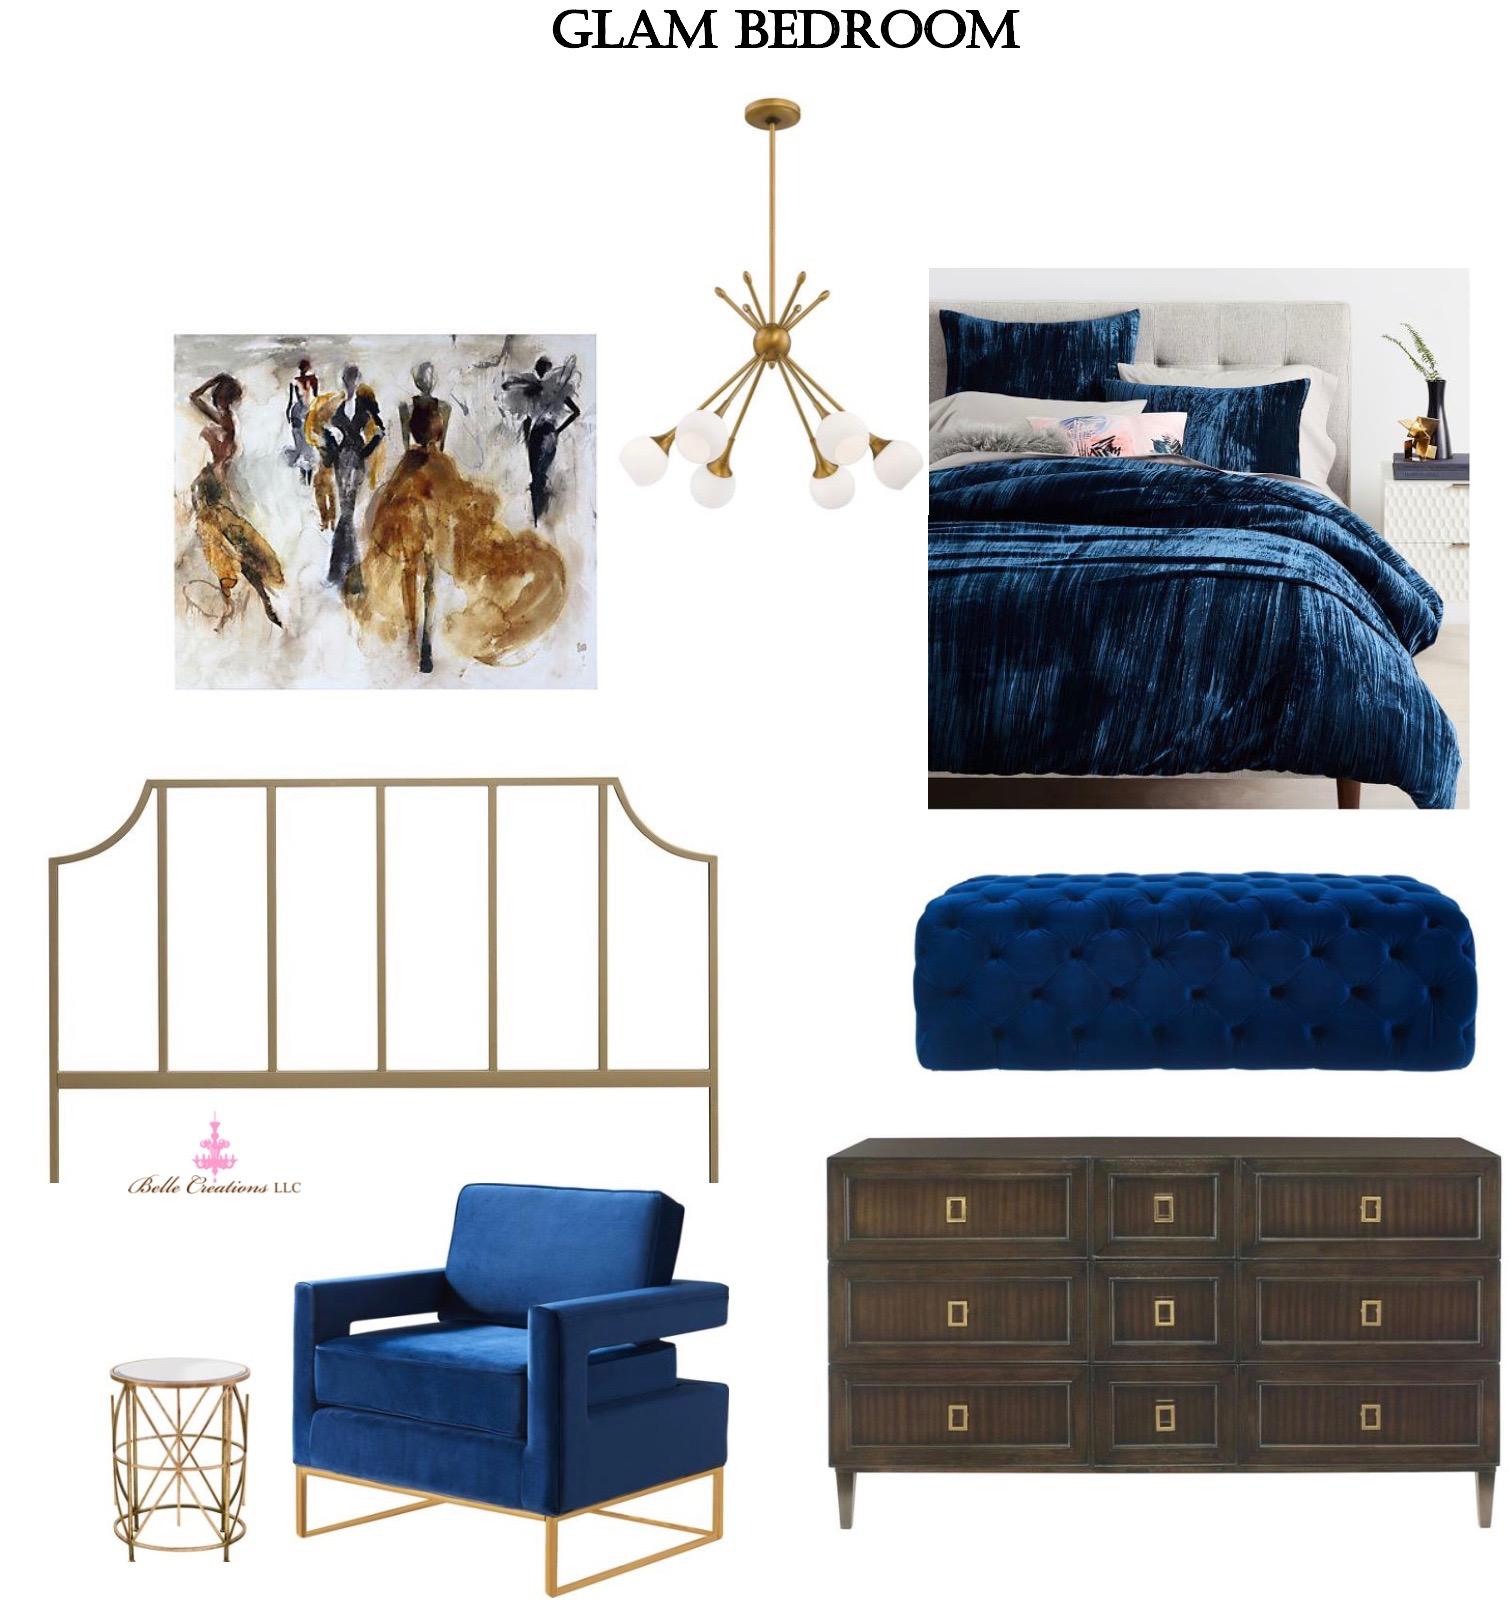 Contemporary Glam Bedroom